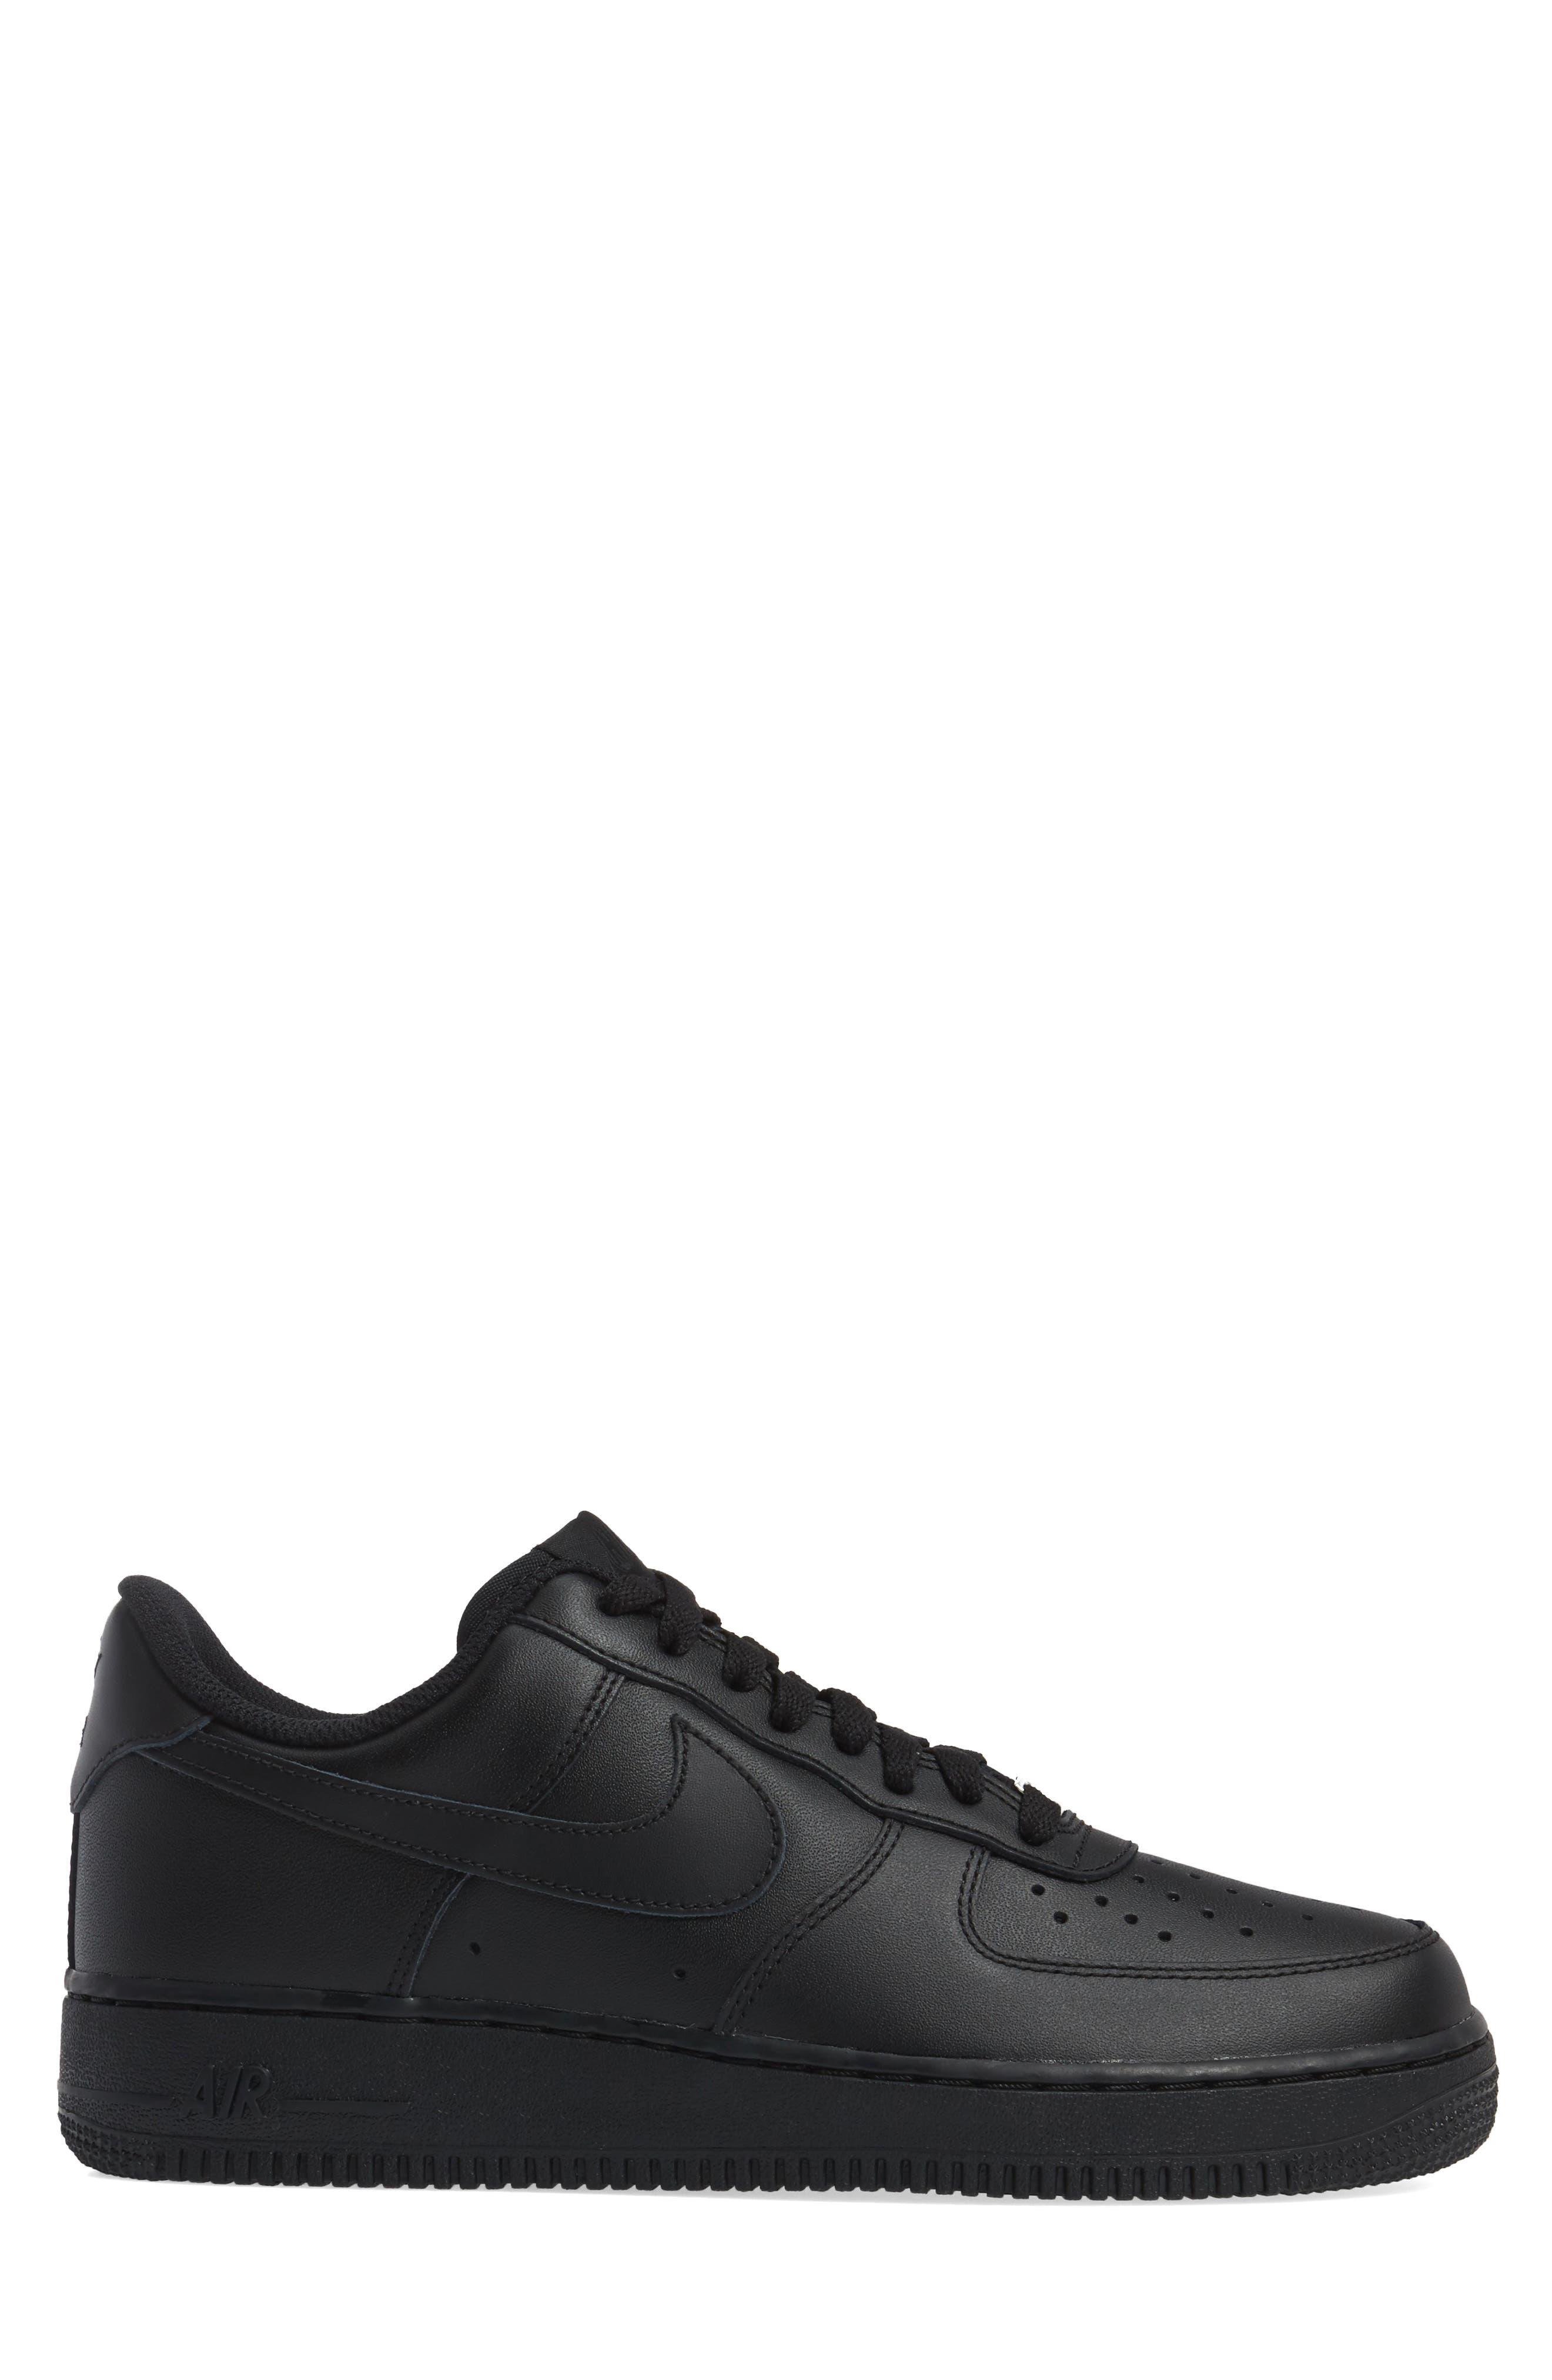 NIKE, Air Force 1 '07 Sneaker, Alternate thumbnail 3, color, BLACK/ BLACK